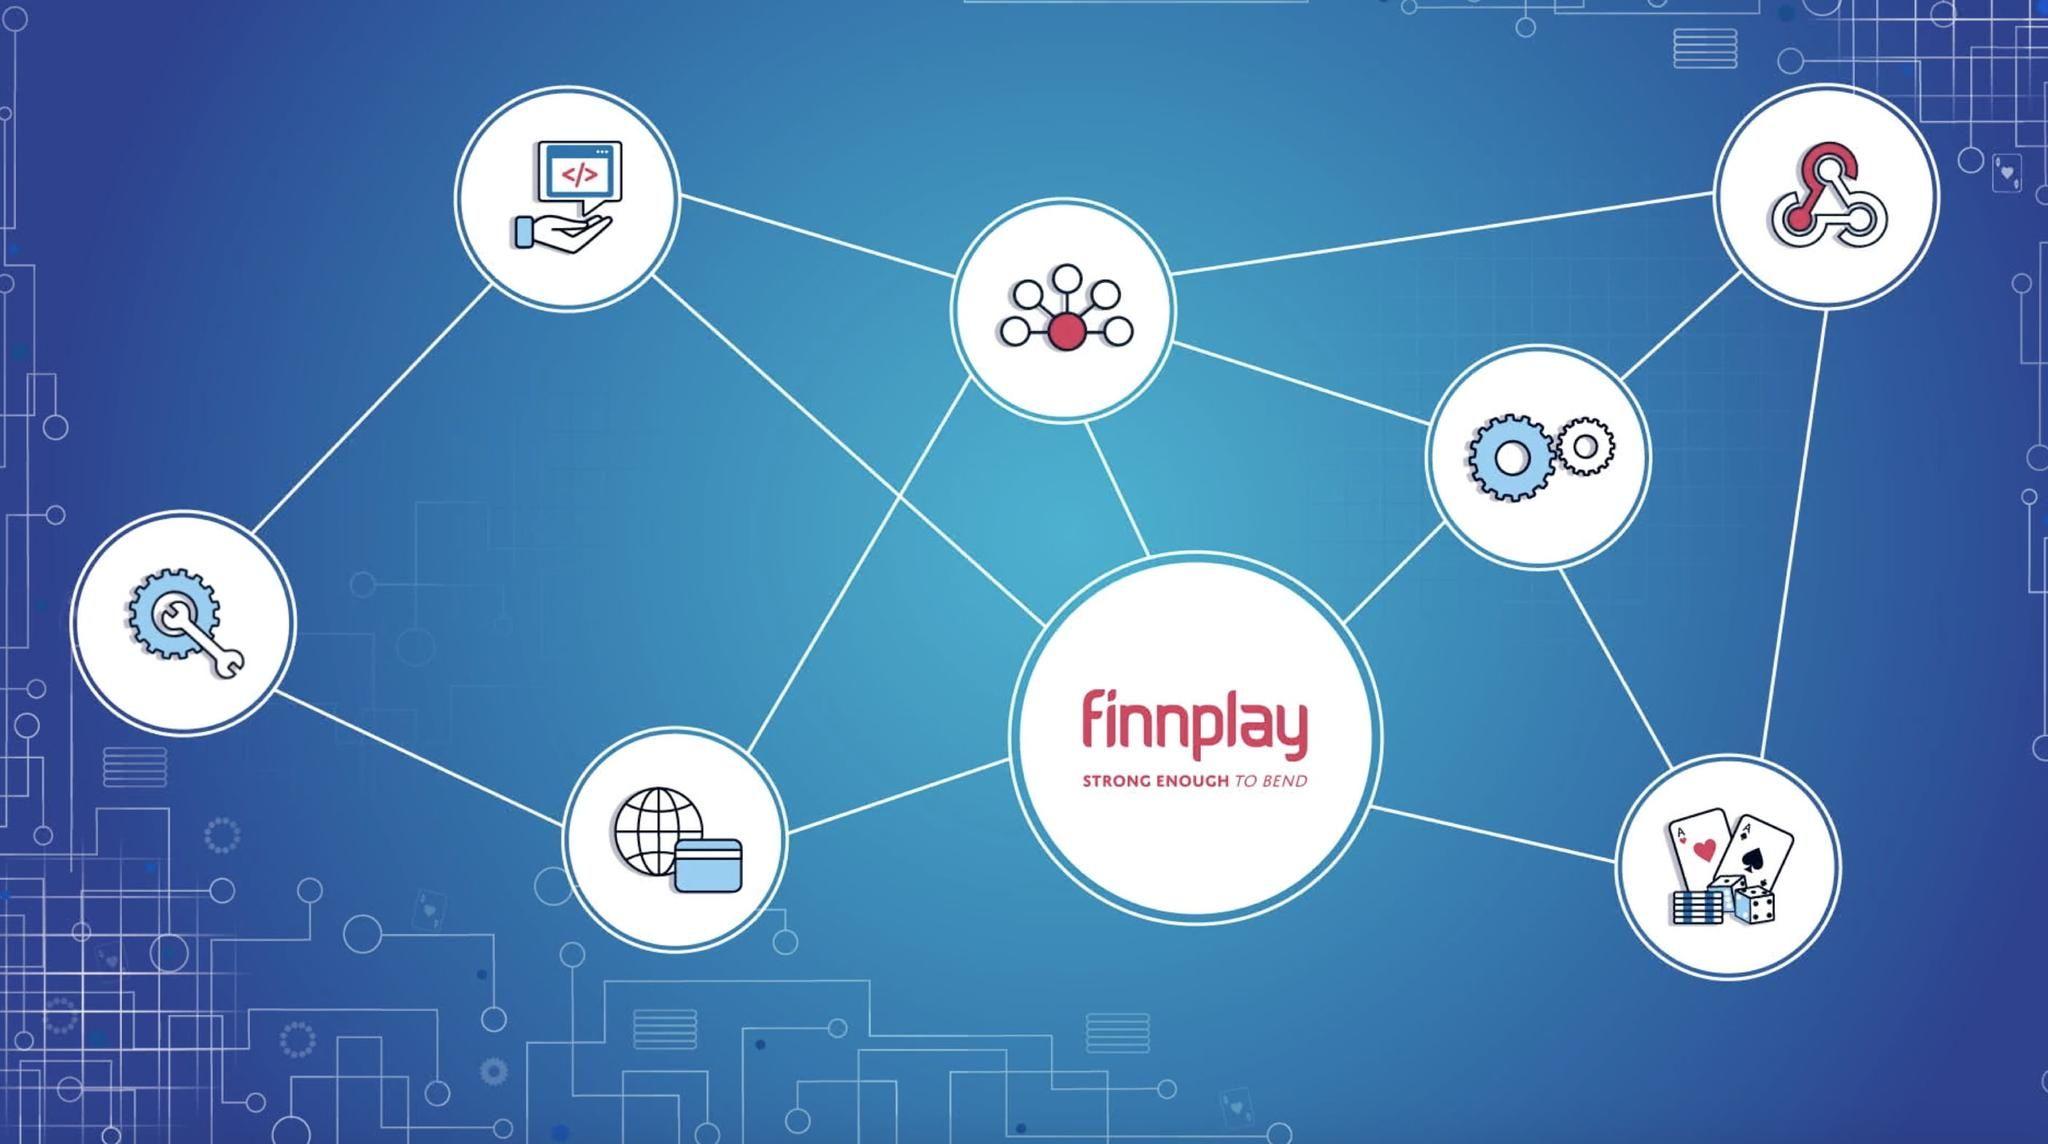 Introducing Finnplay